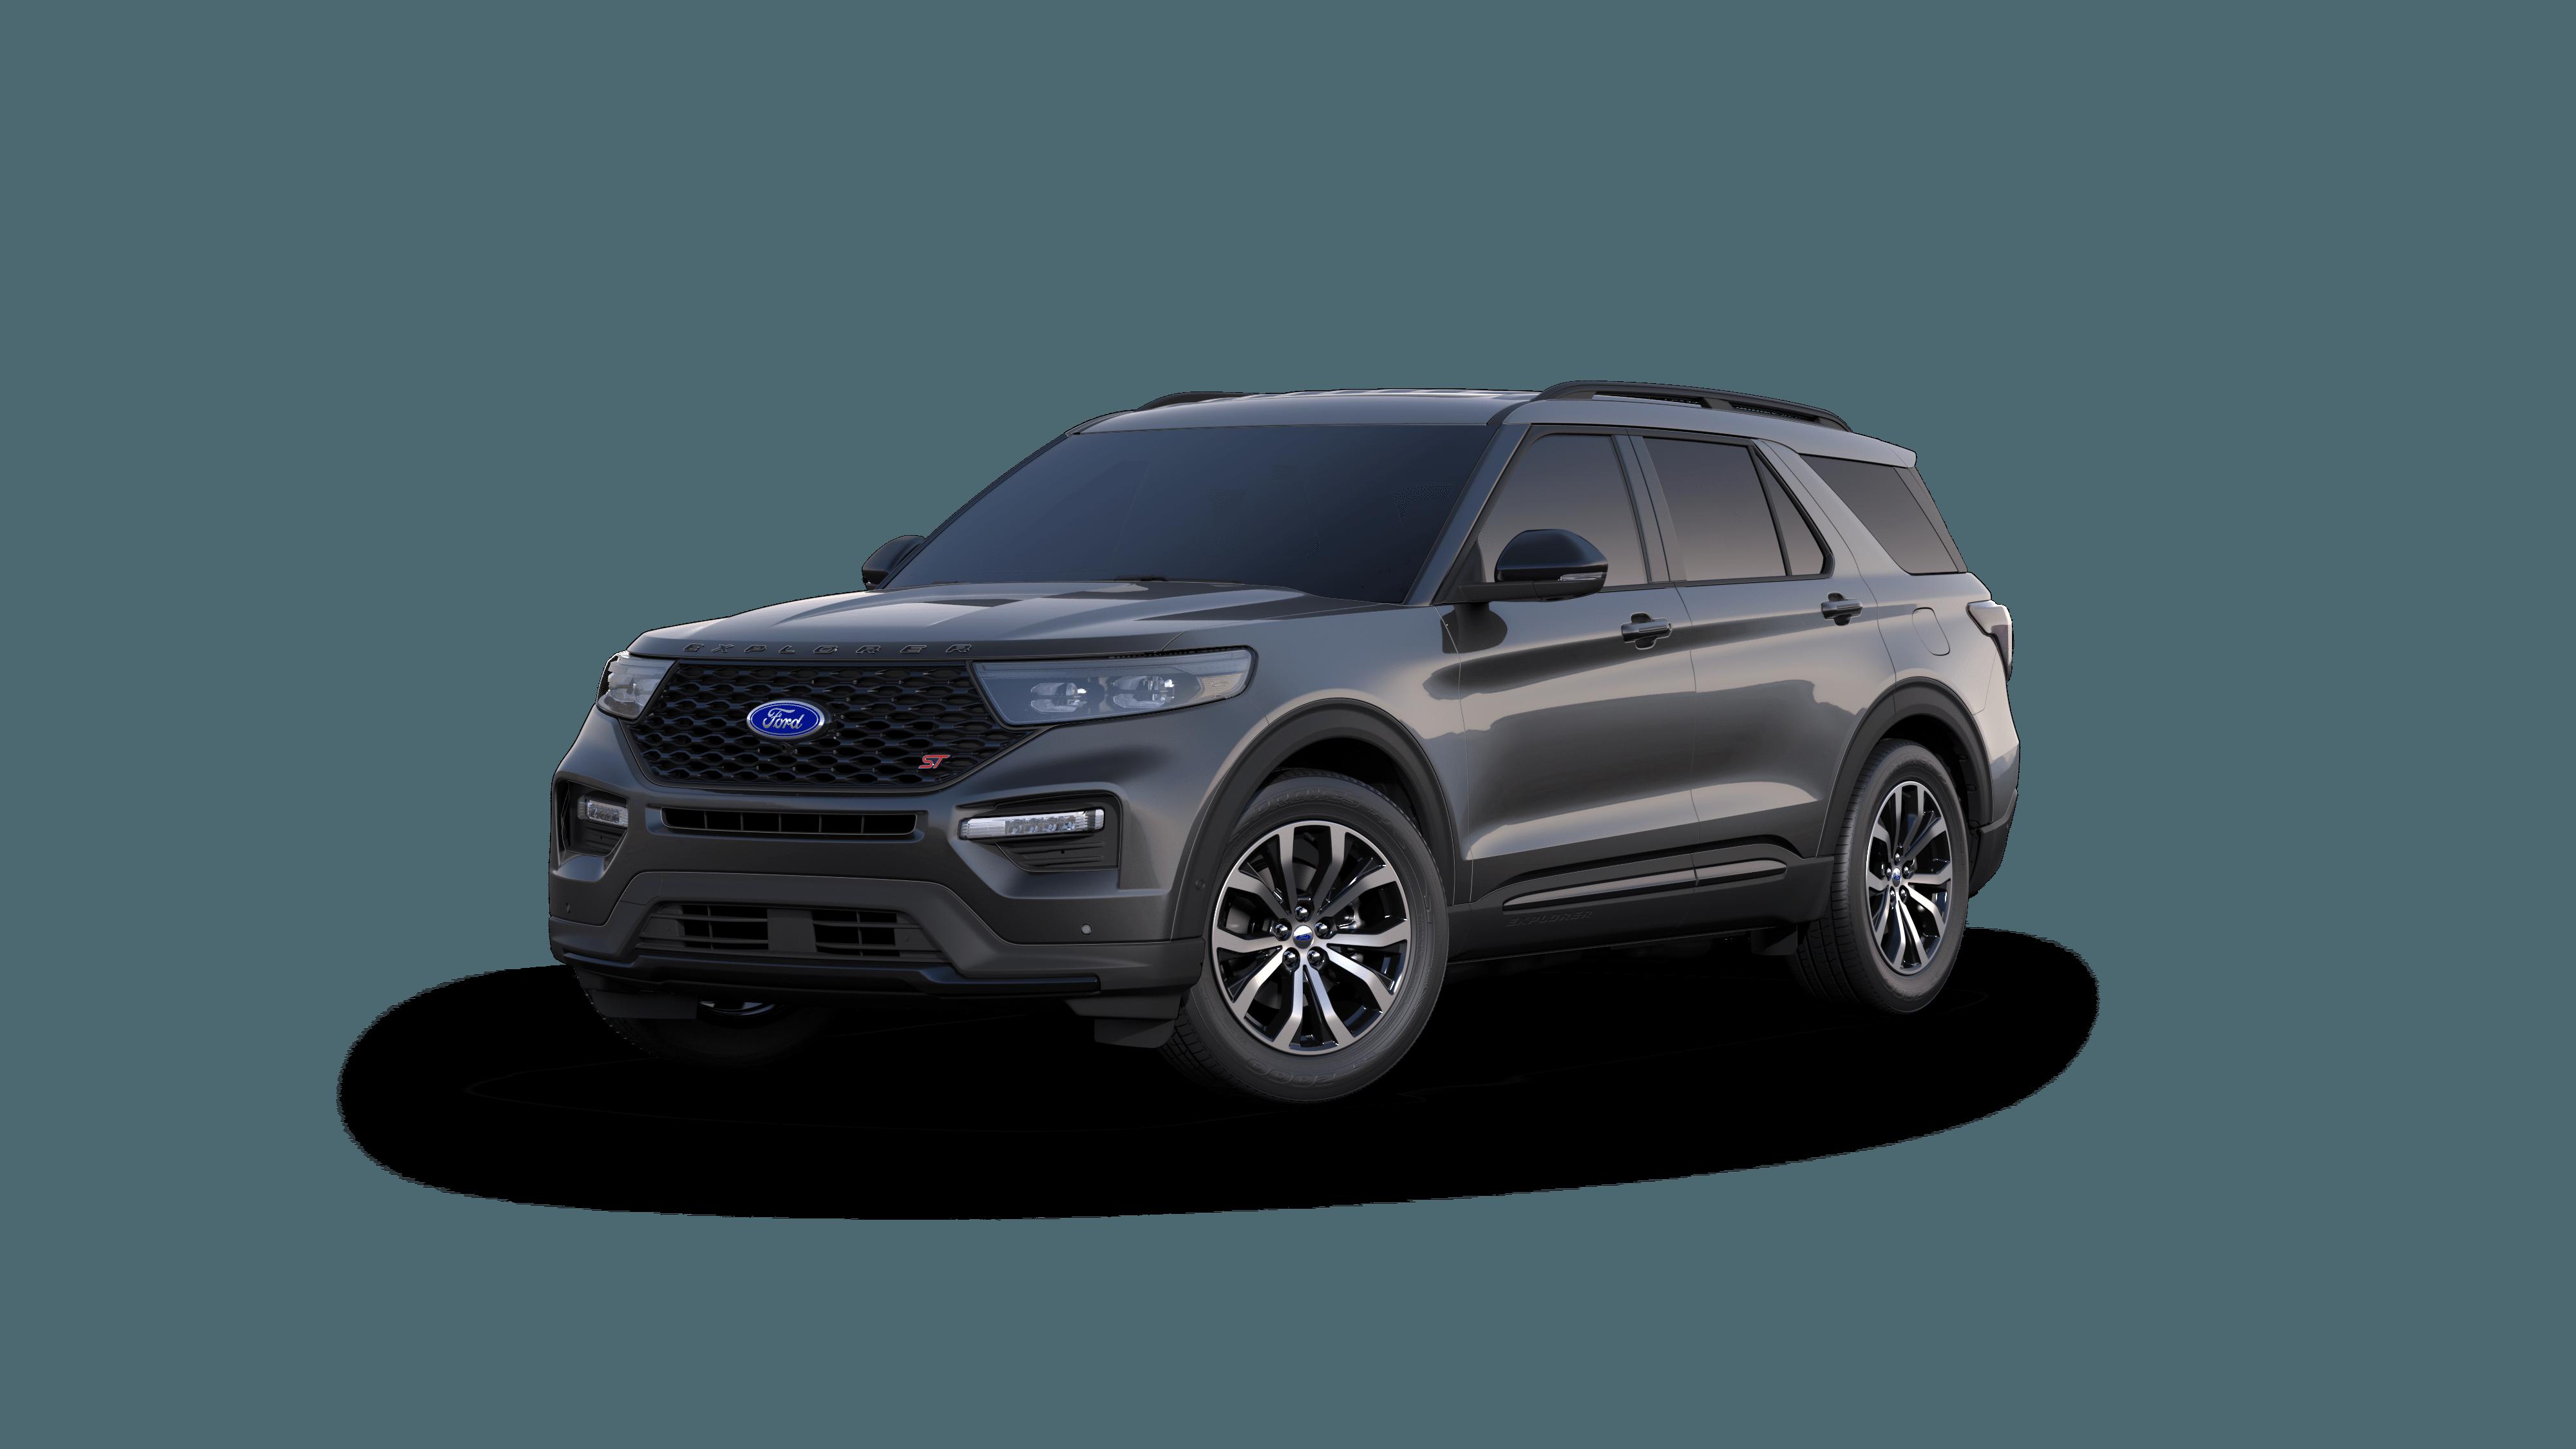 2020 Ford Explorer for sale in Little Rock, near Benton, Bryant, Cabot,  Sherwood, AR - - Crain